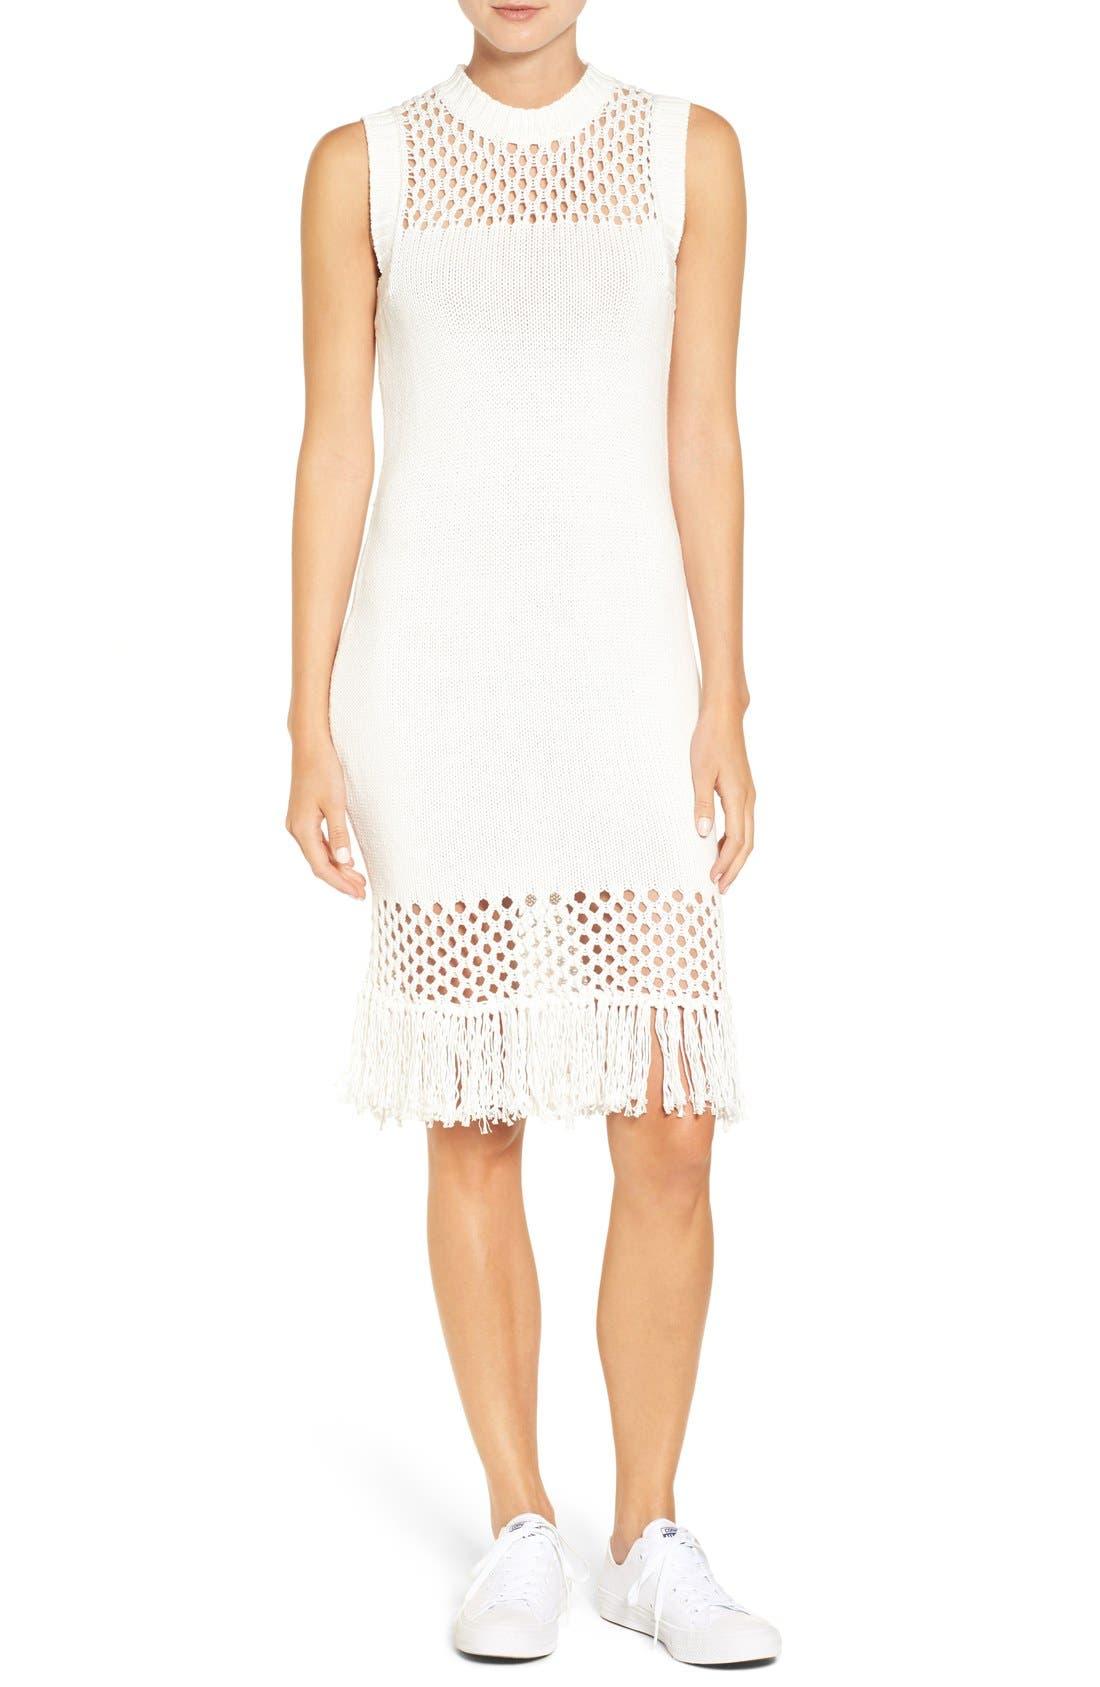 Main Image - Amour Vert 'Helen' Illusion Knit Cotton Dress